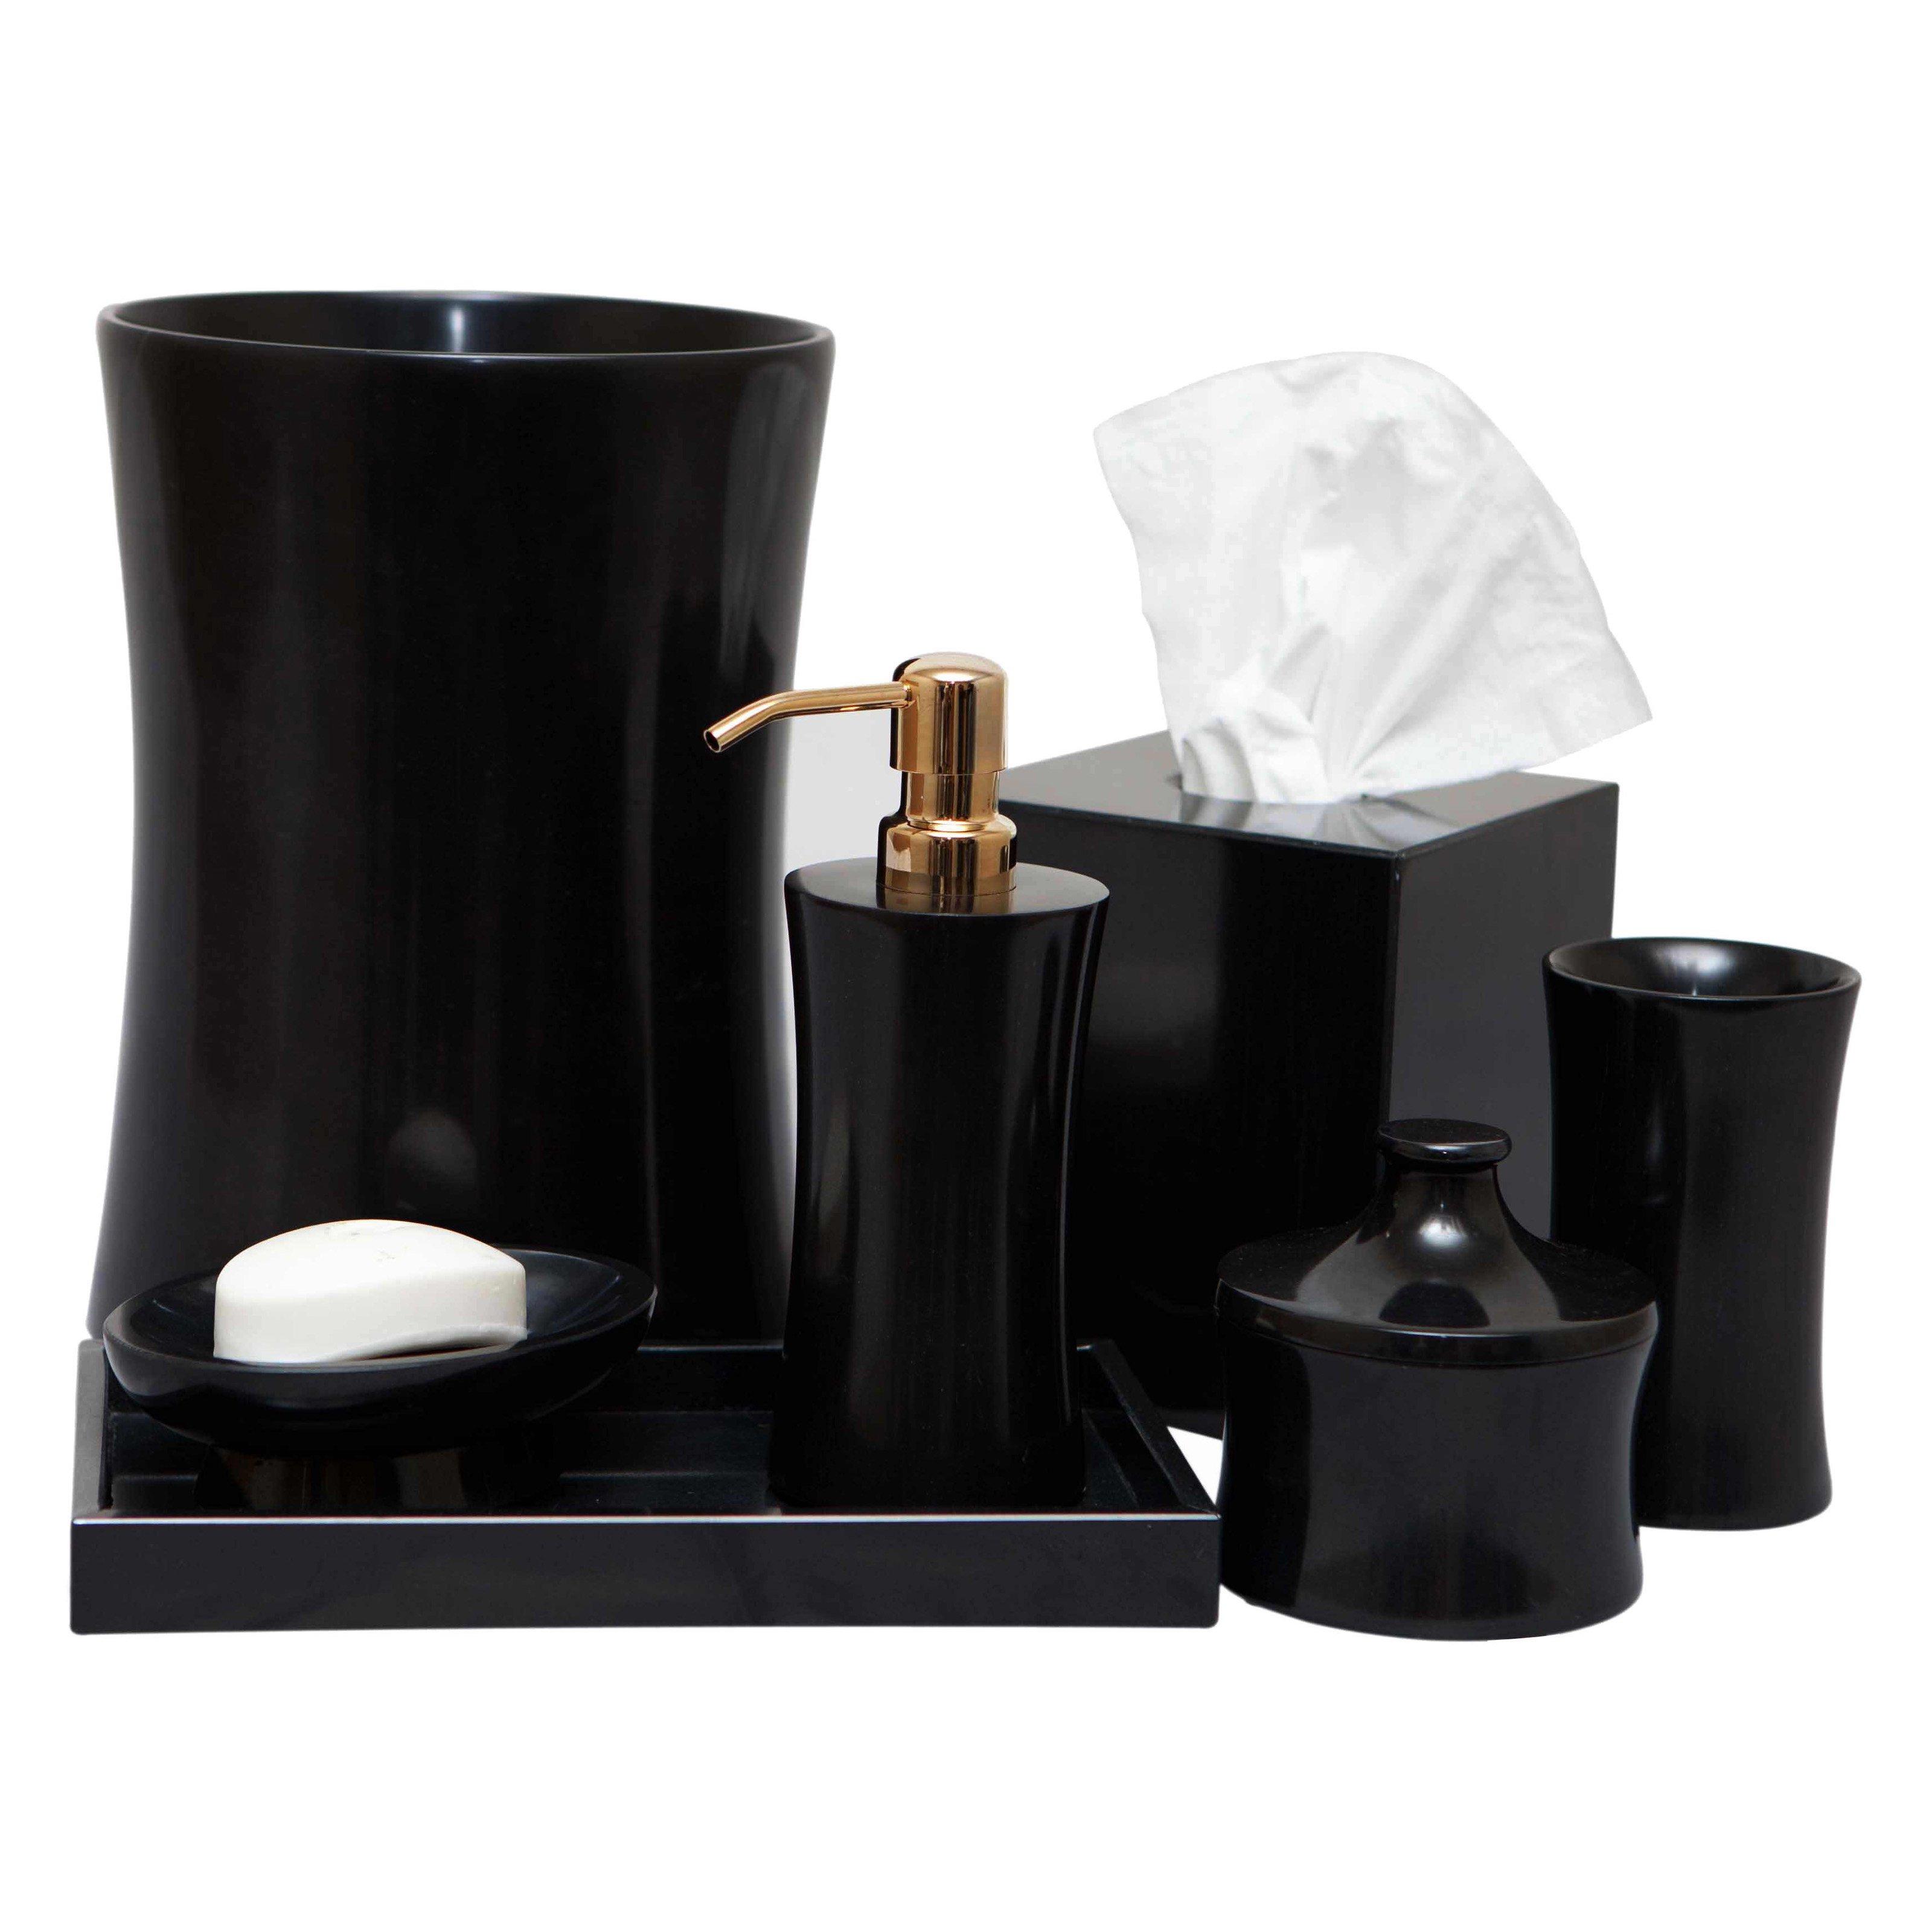 Vinca 7-Piece Bathroom Accessories - Jet Black Marble